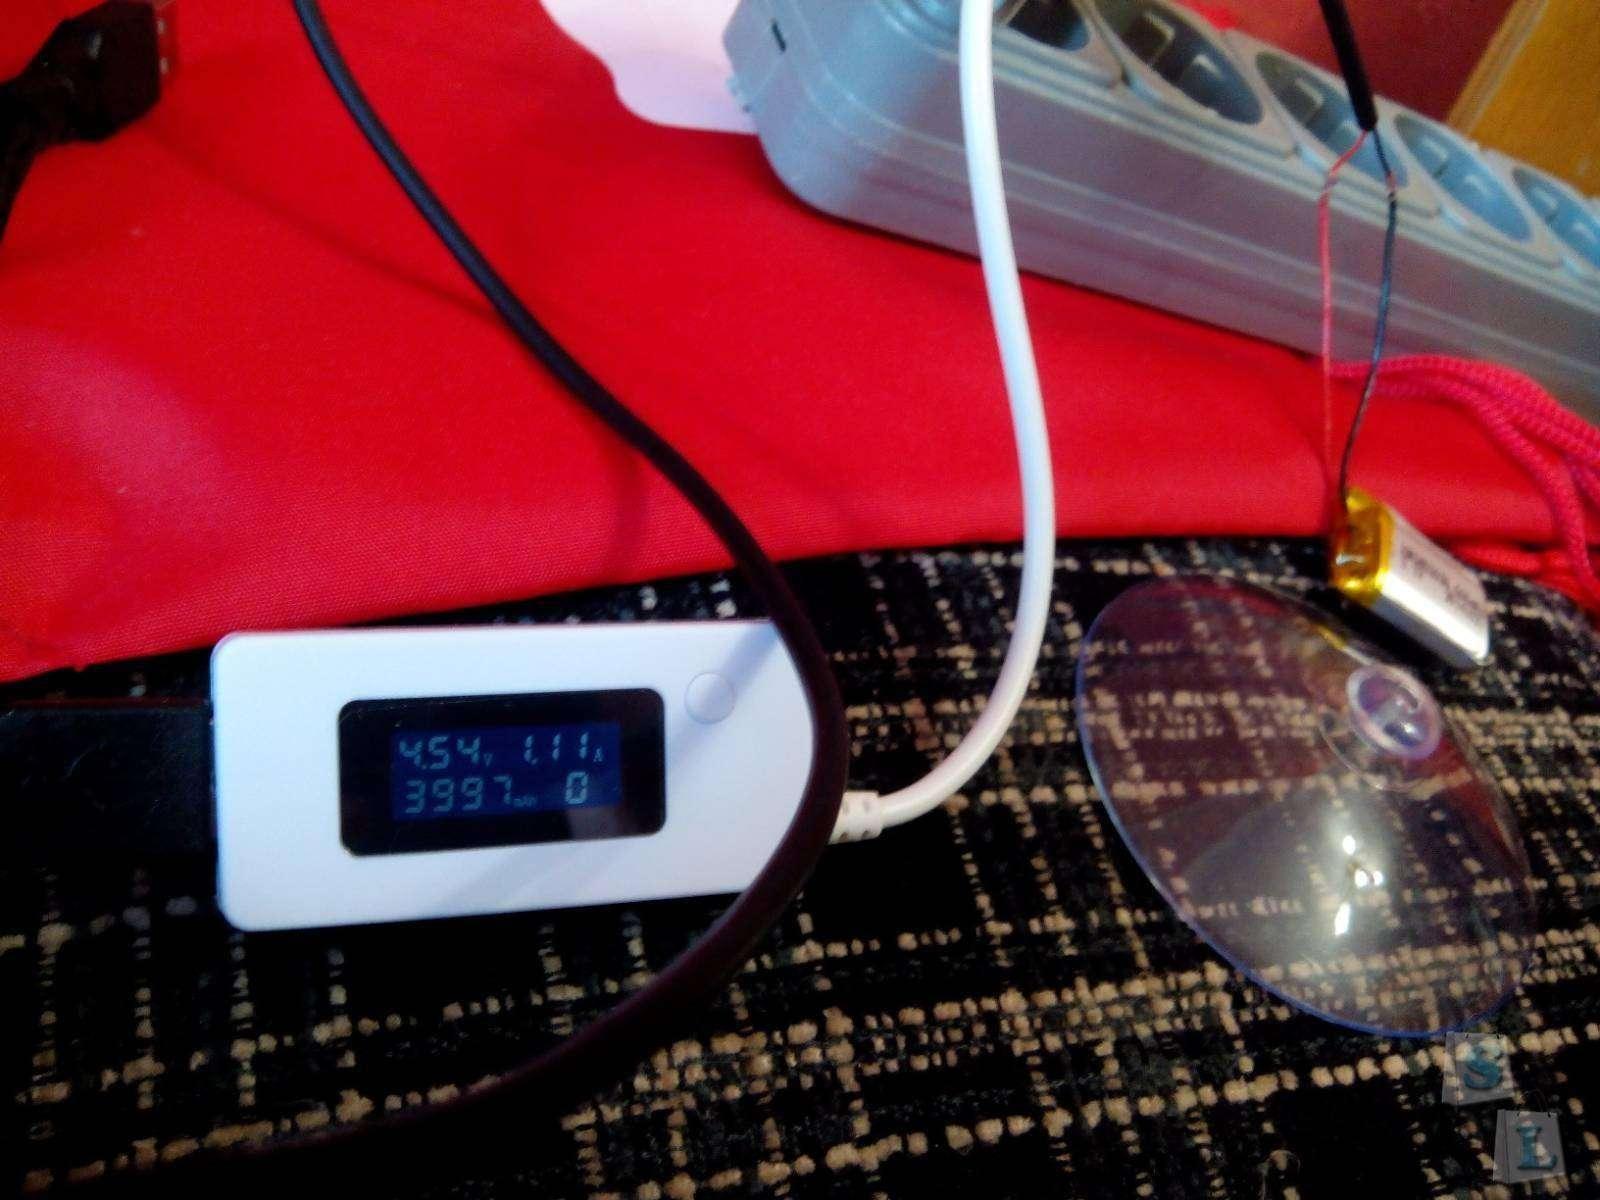 Banggood: Comiso C6 Waterproof Shockproof Dustproof Bluetooth Speaker Блютуз колонка